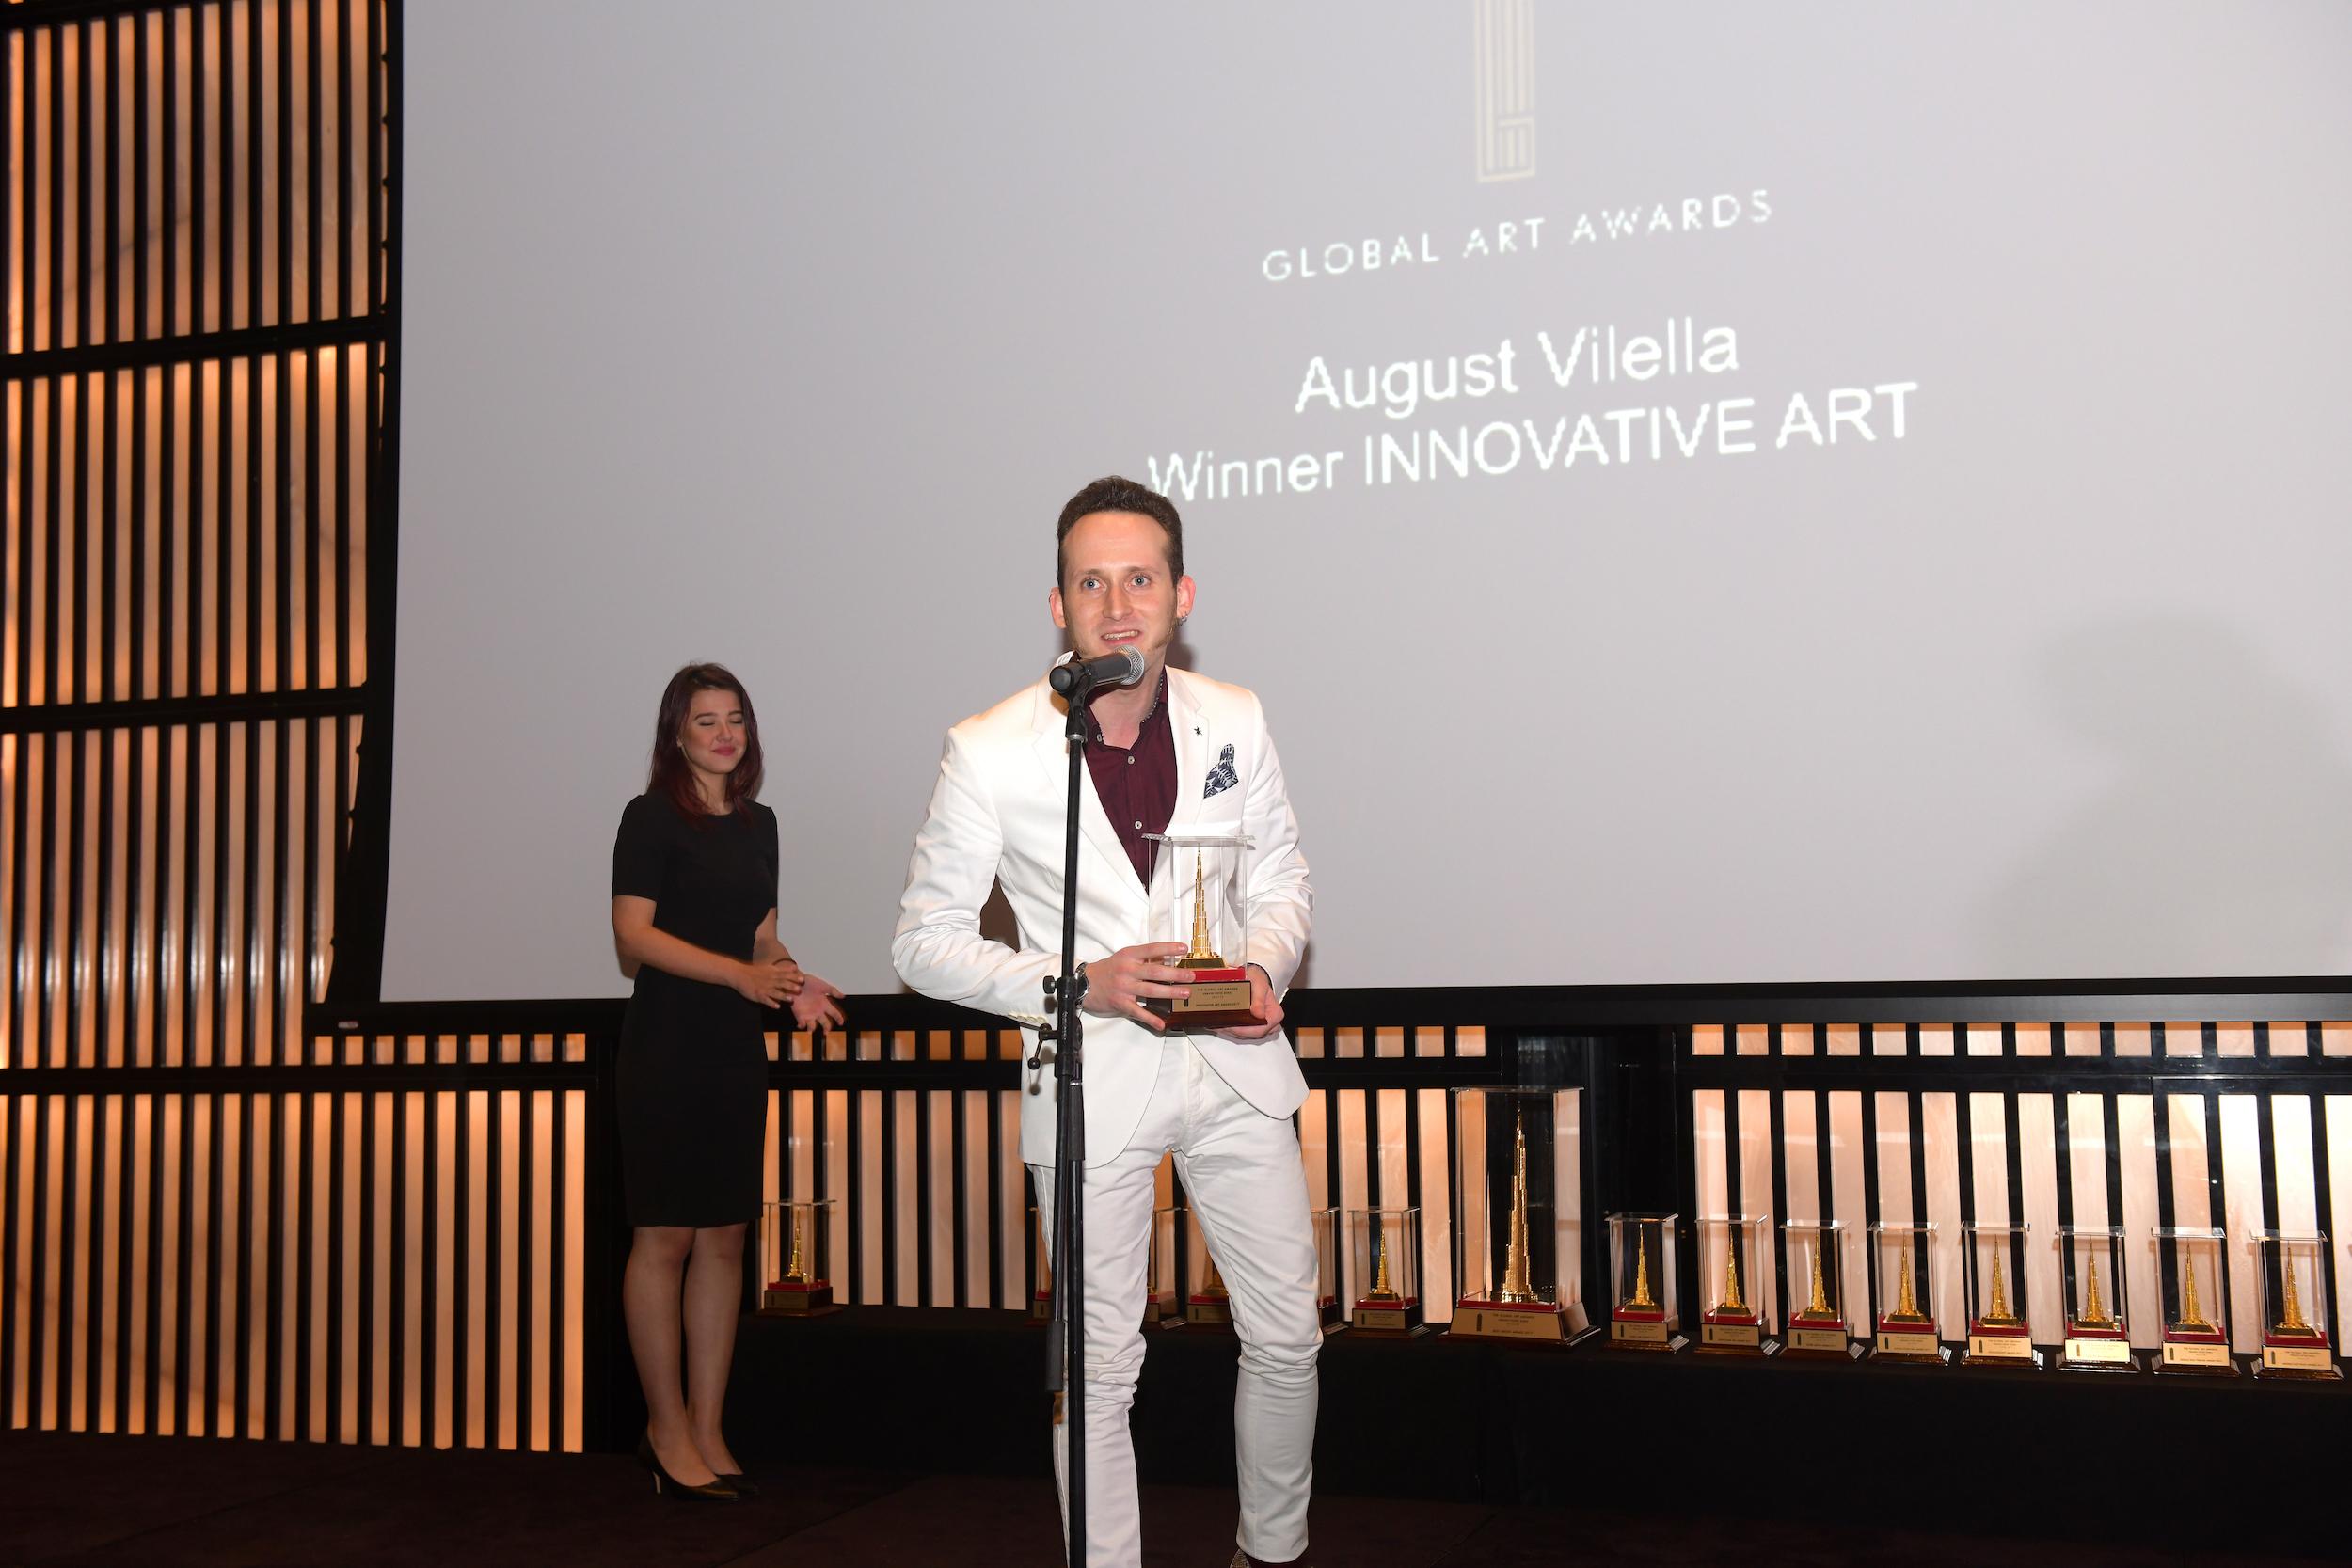 INNOVATIVE ART AWARD   AUGUST VILELLA (SPAIN)